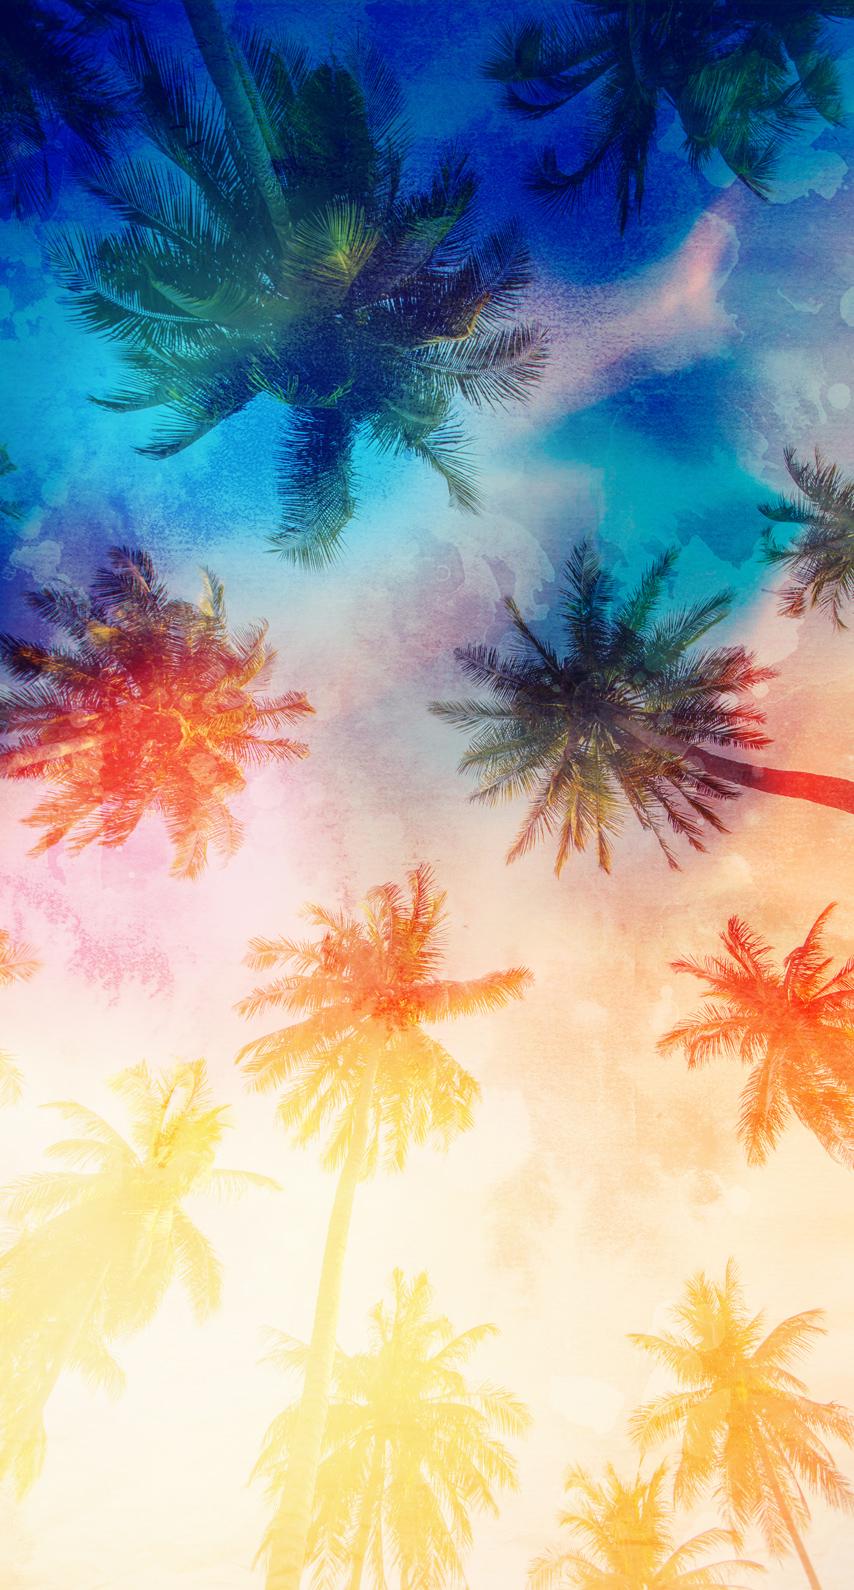 palmtrees, graphic